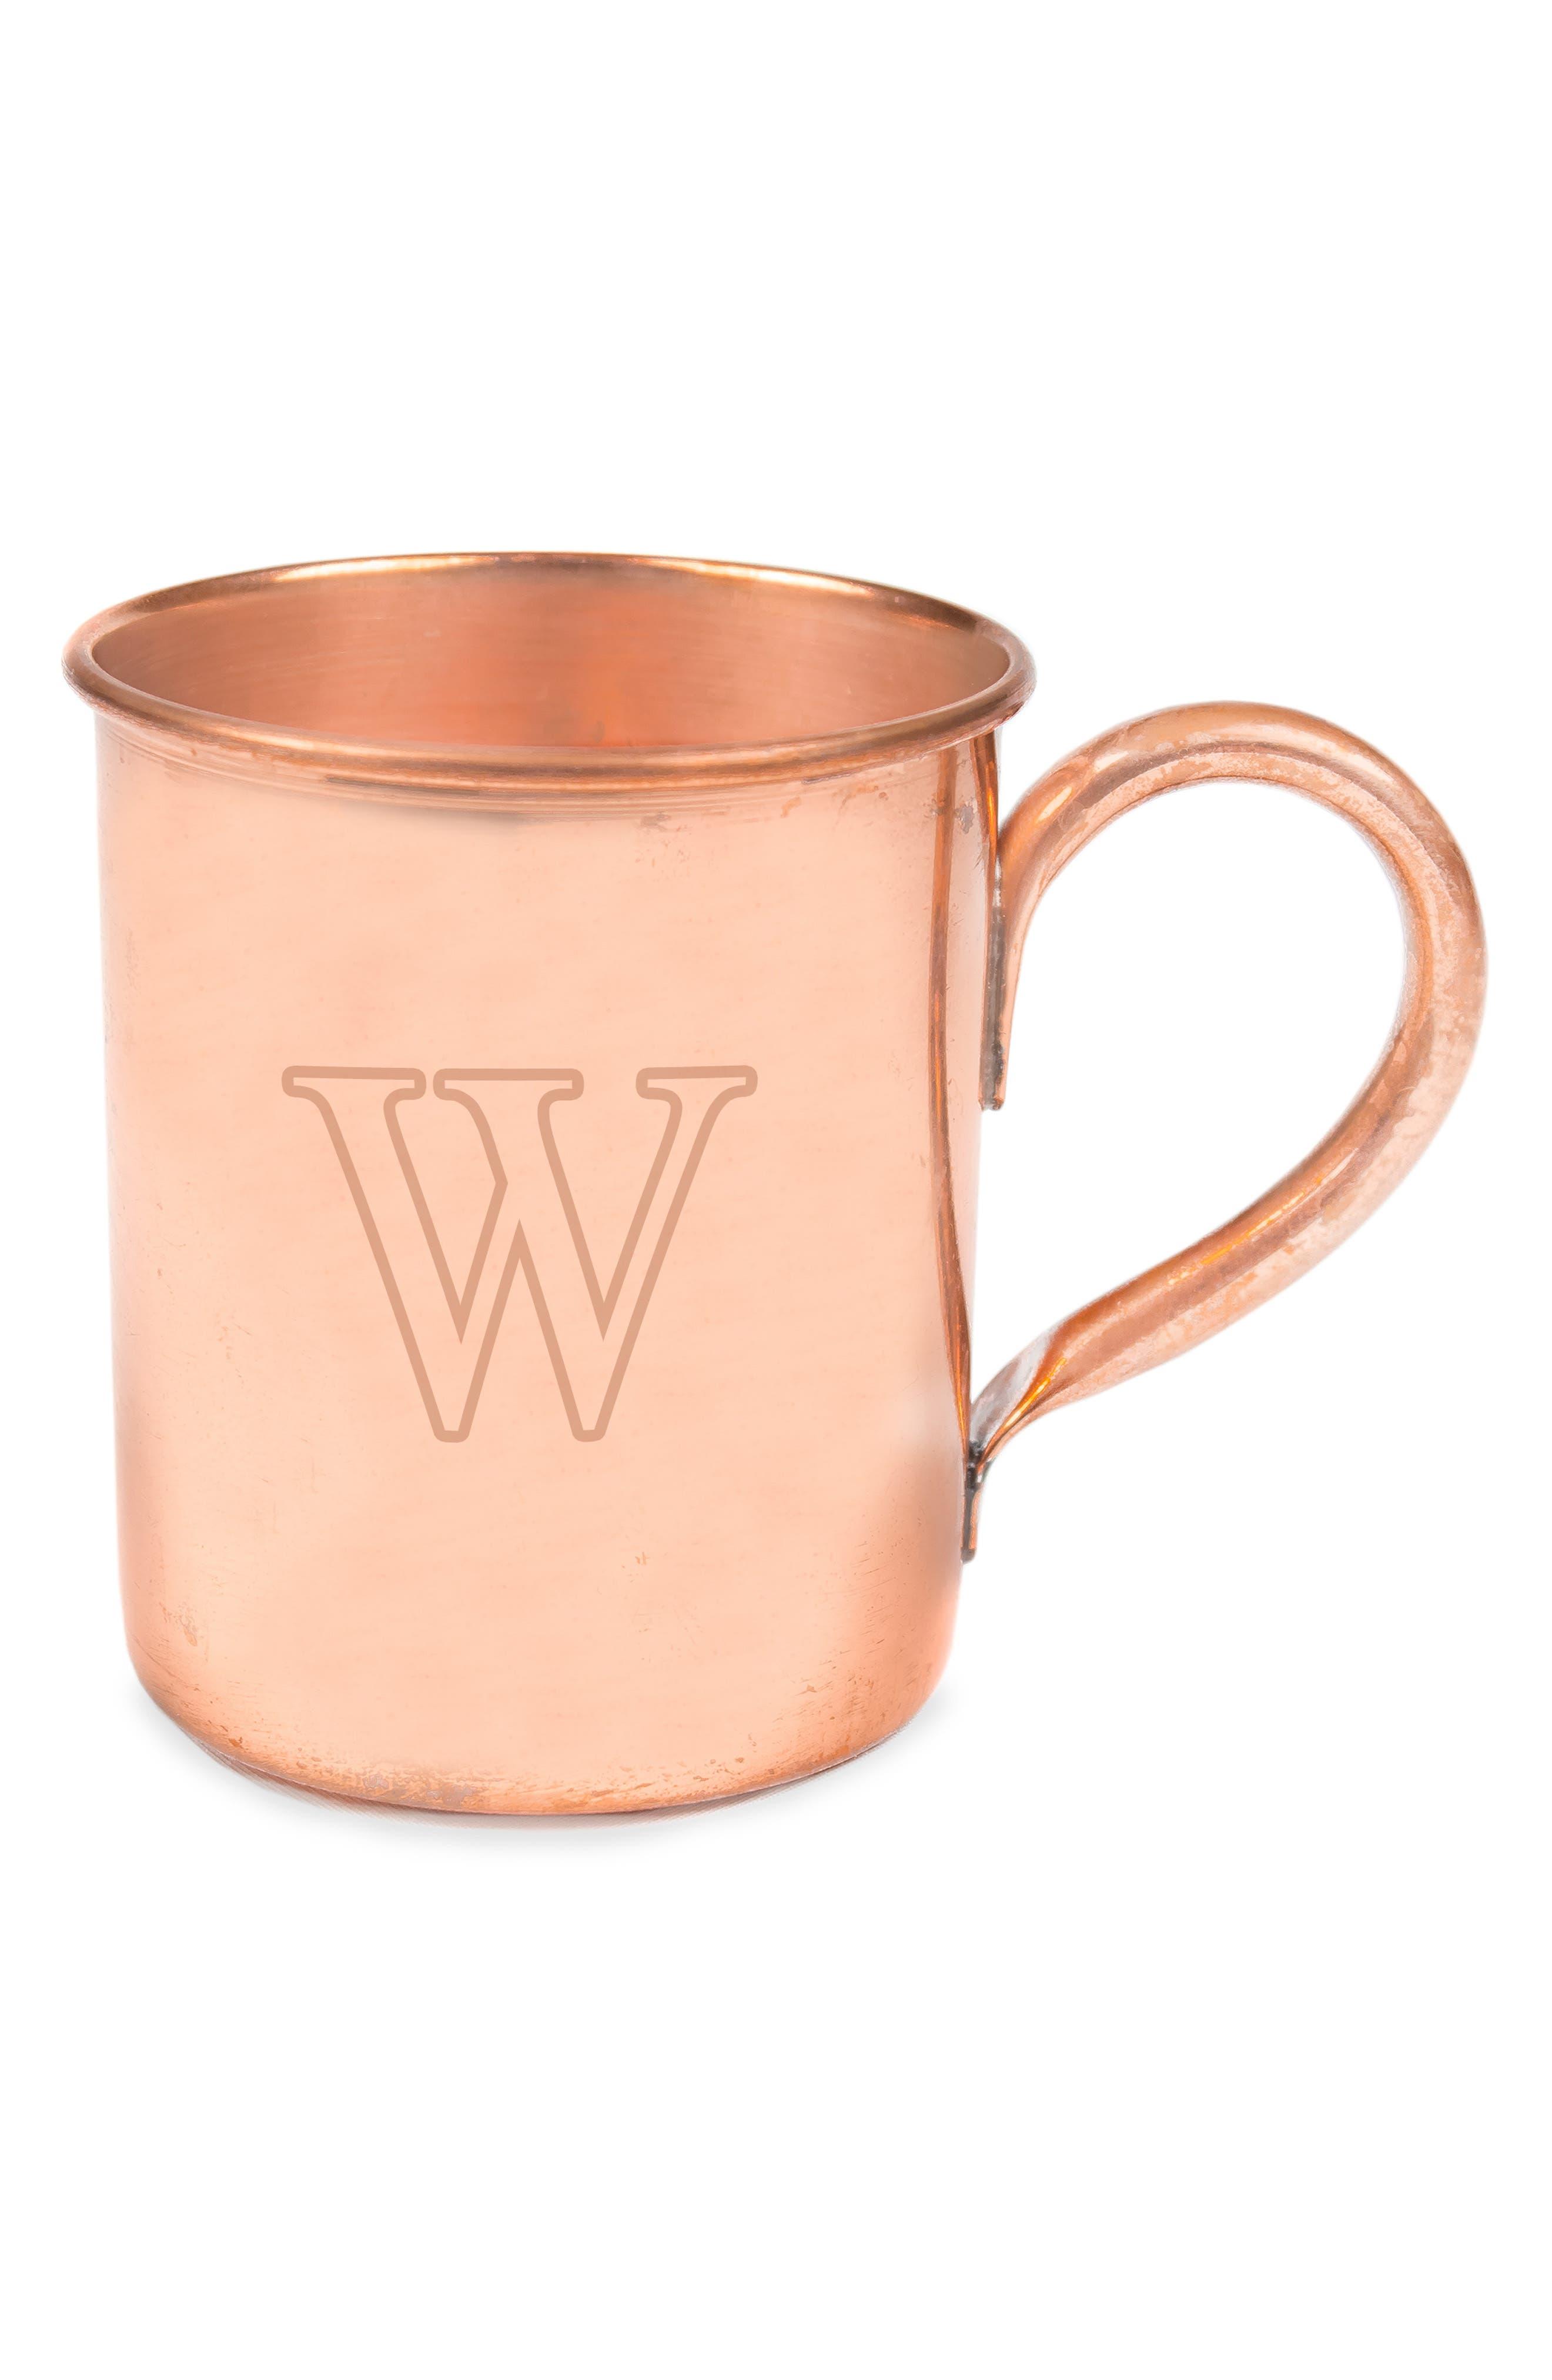 Monogram Moscow Mule Copper Mug,                             Alternate thumbnail 4, color,                             243